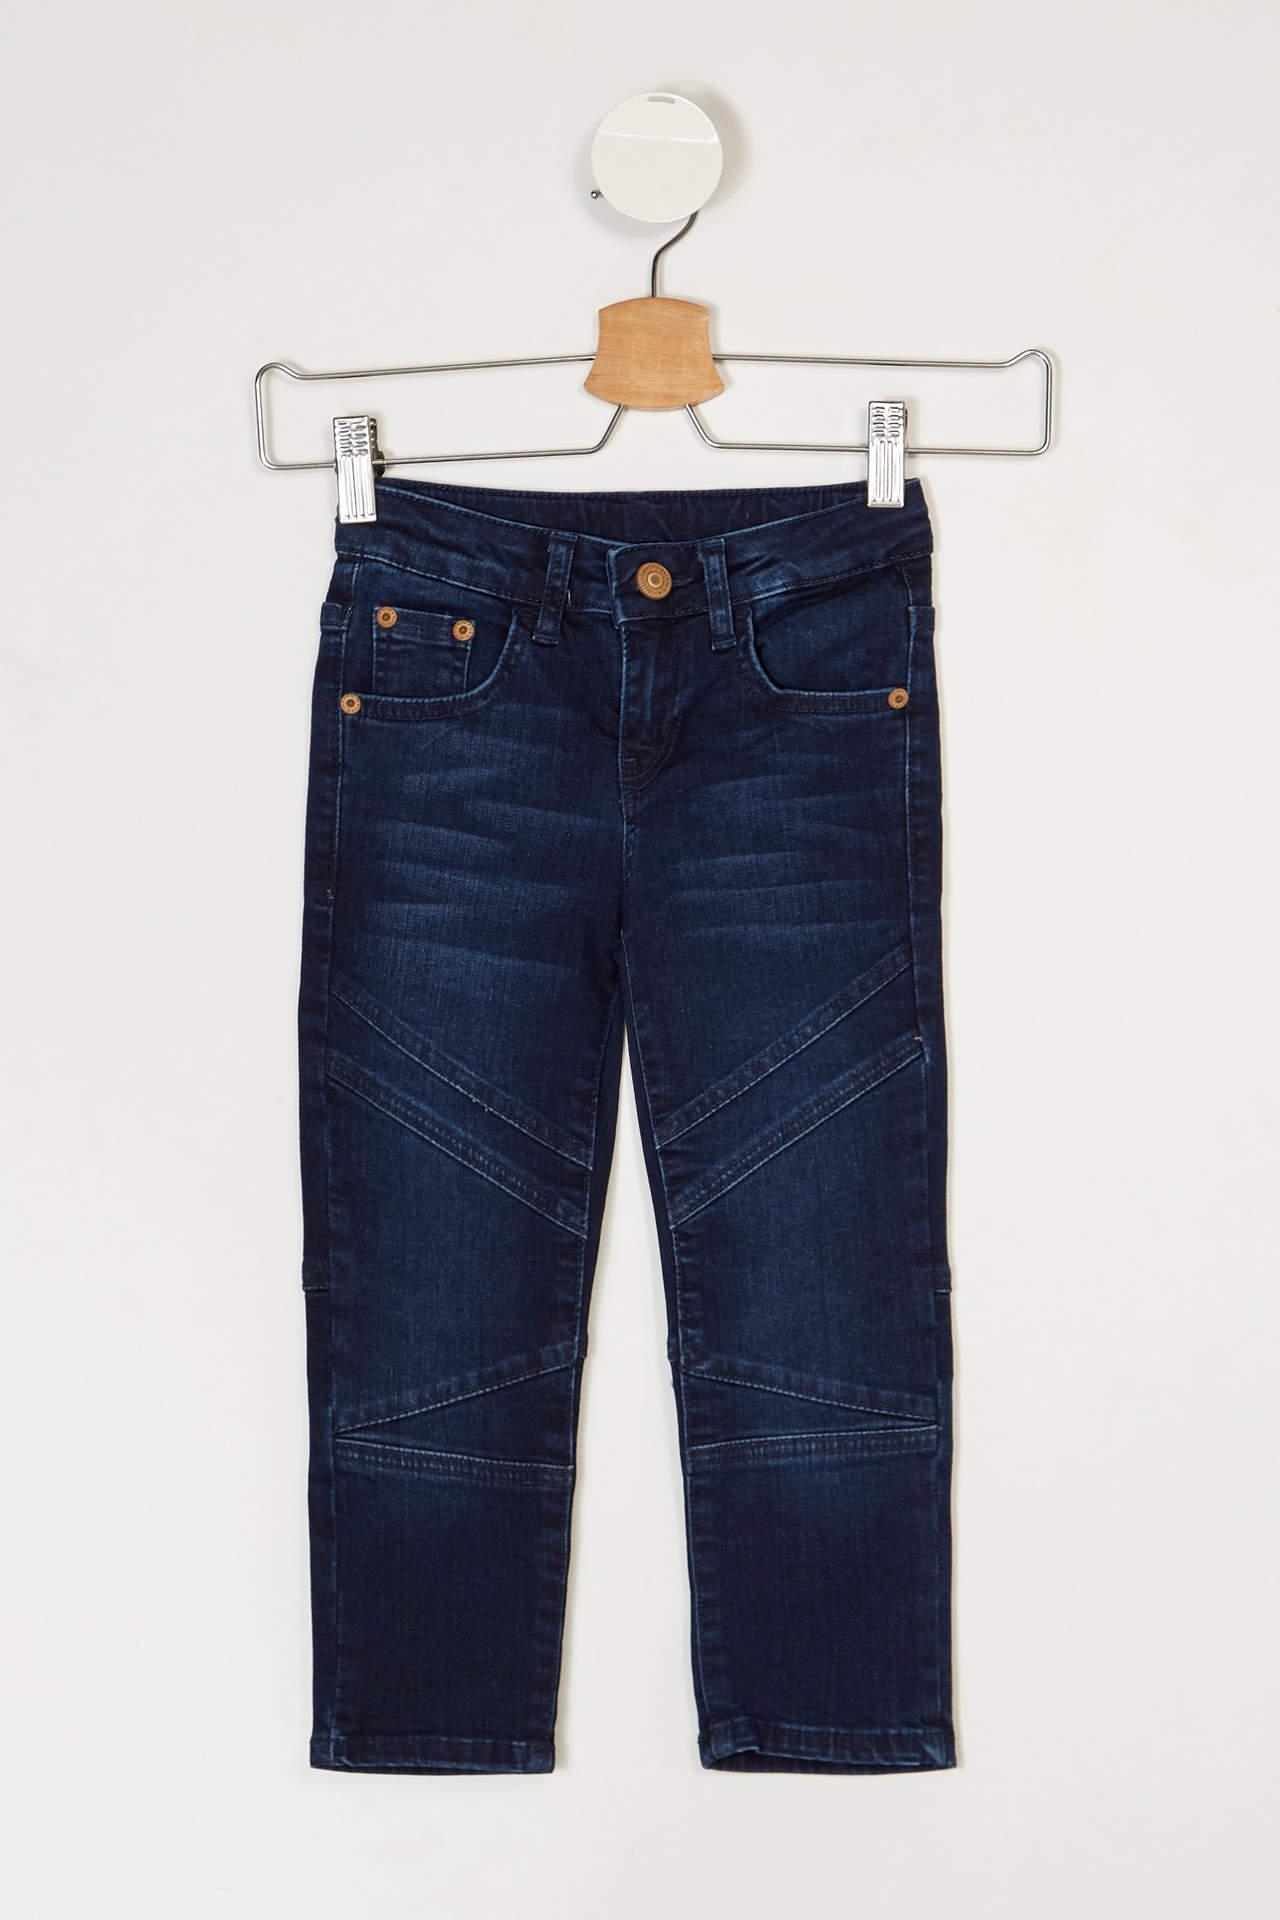 DeFacto Erkek Çocuk Slim Fit Jean Pantolon male